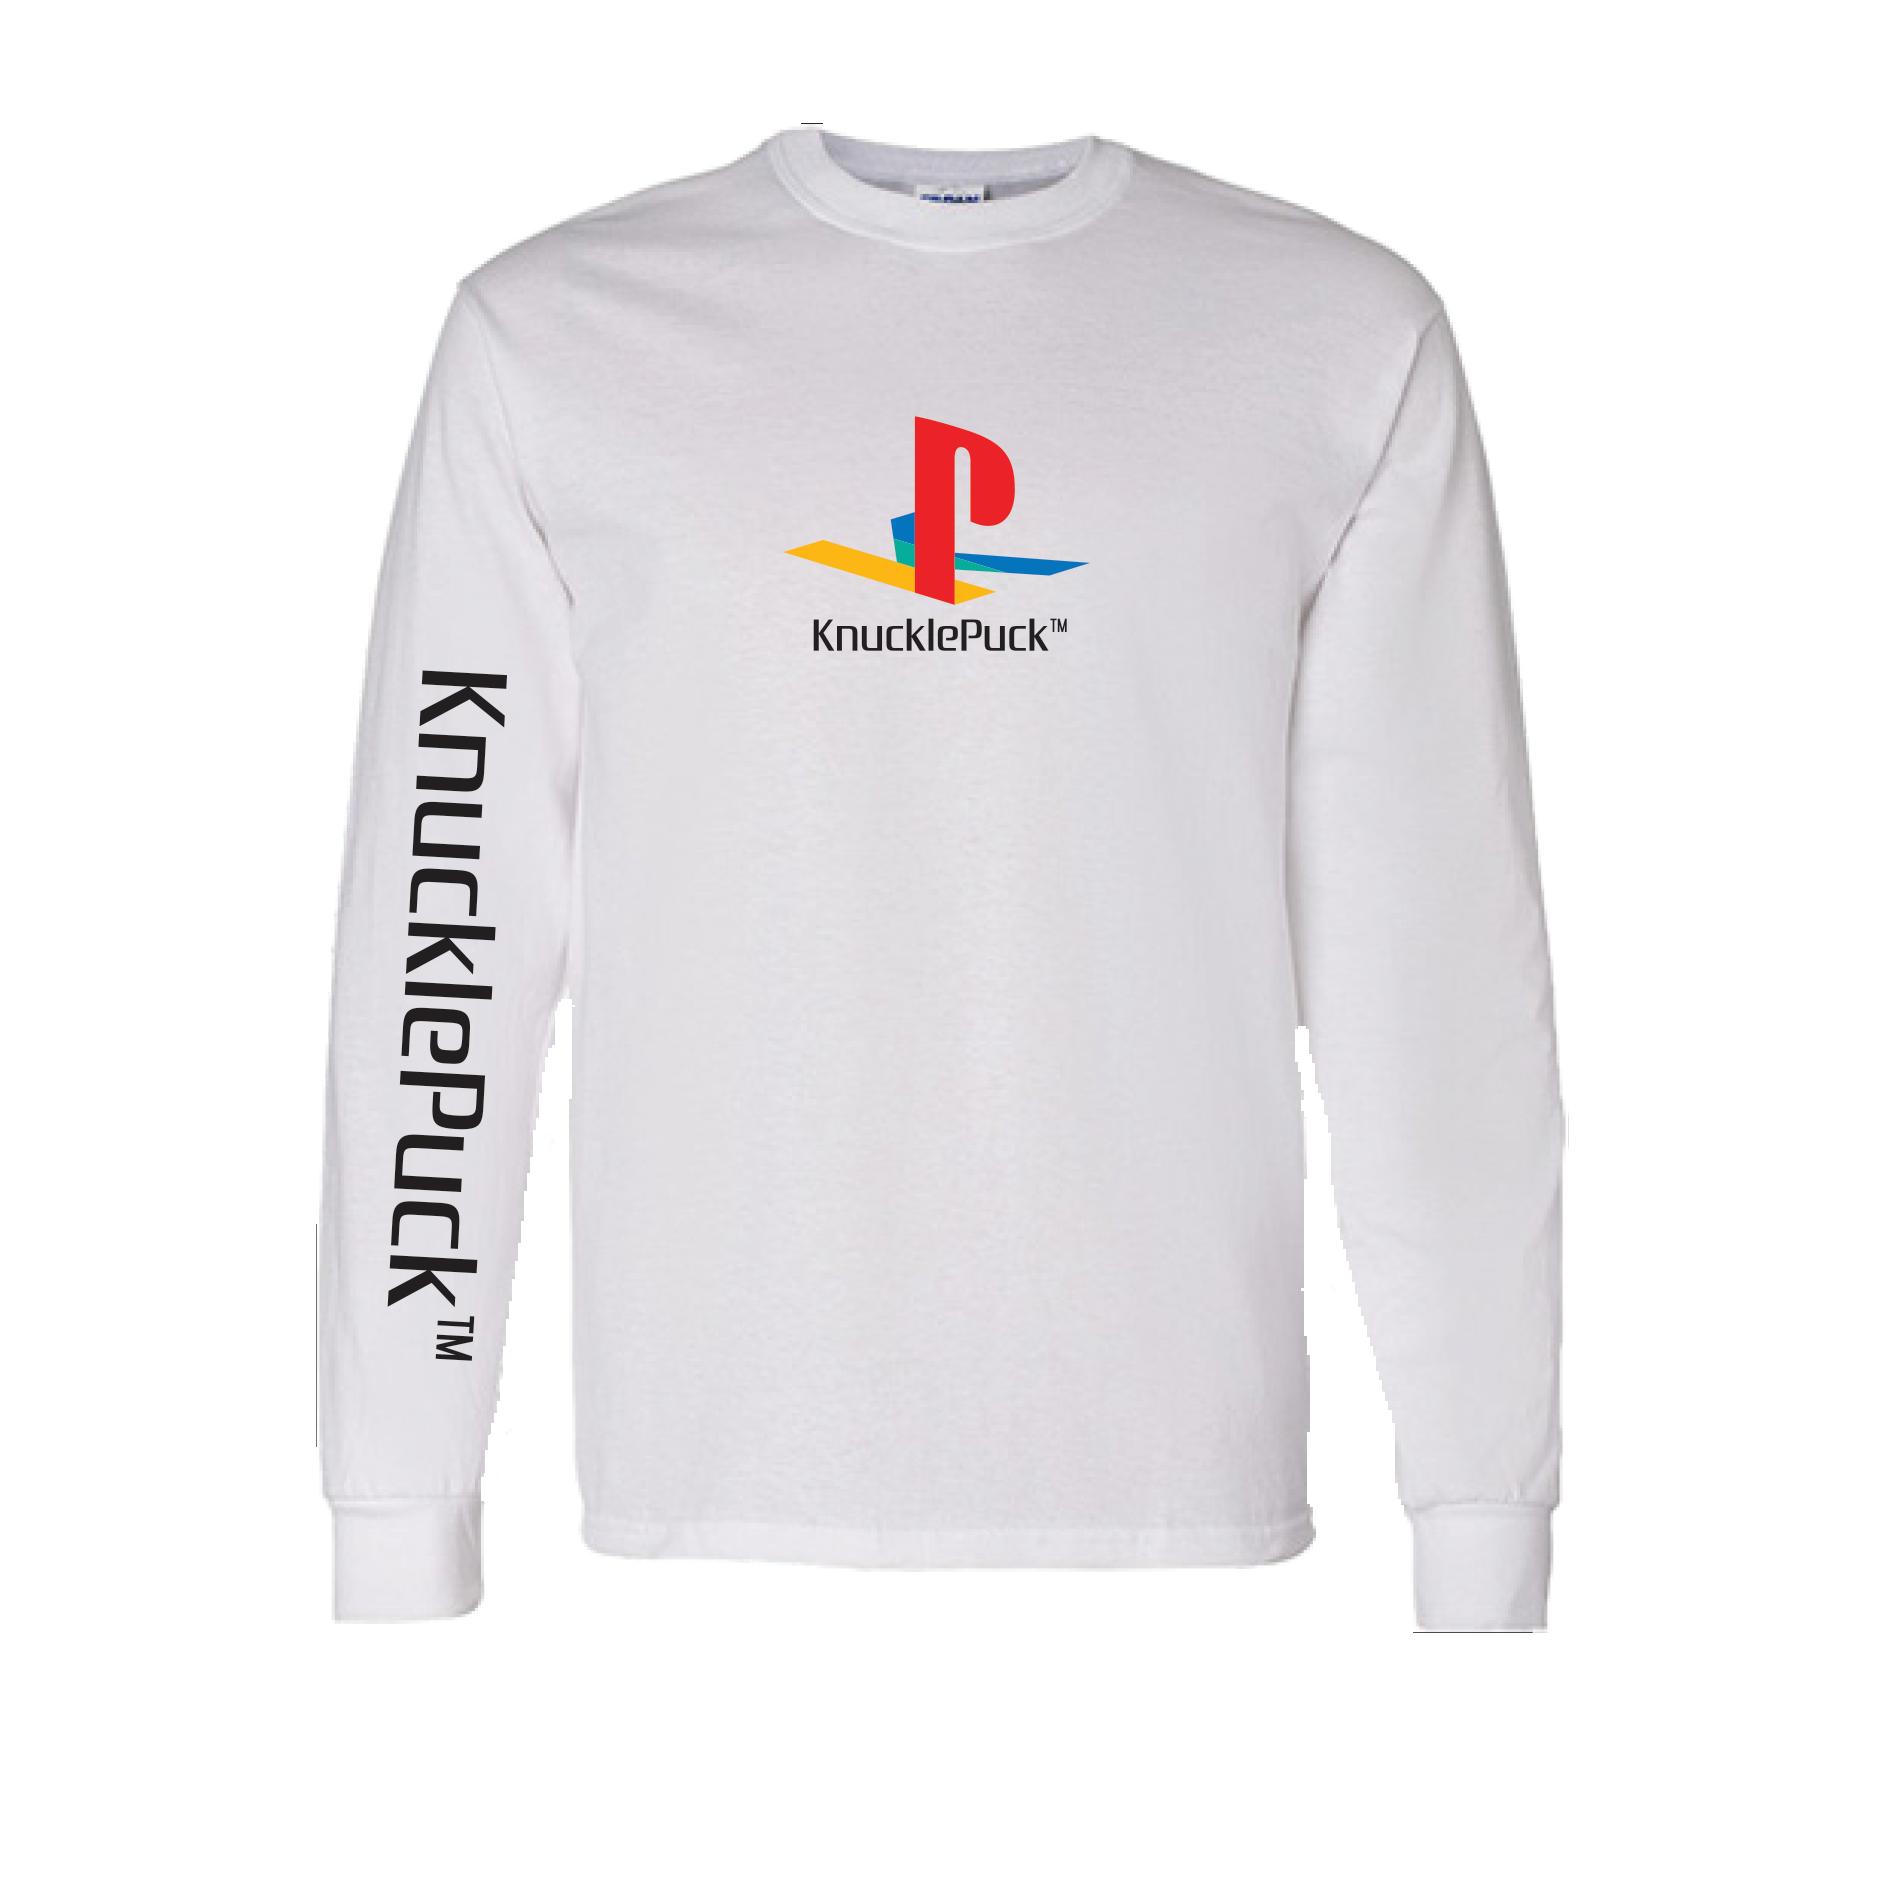 Playstation Longsleeve T-Shirt